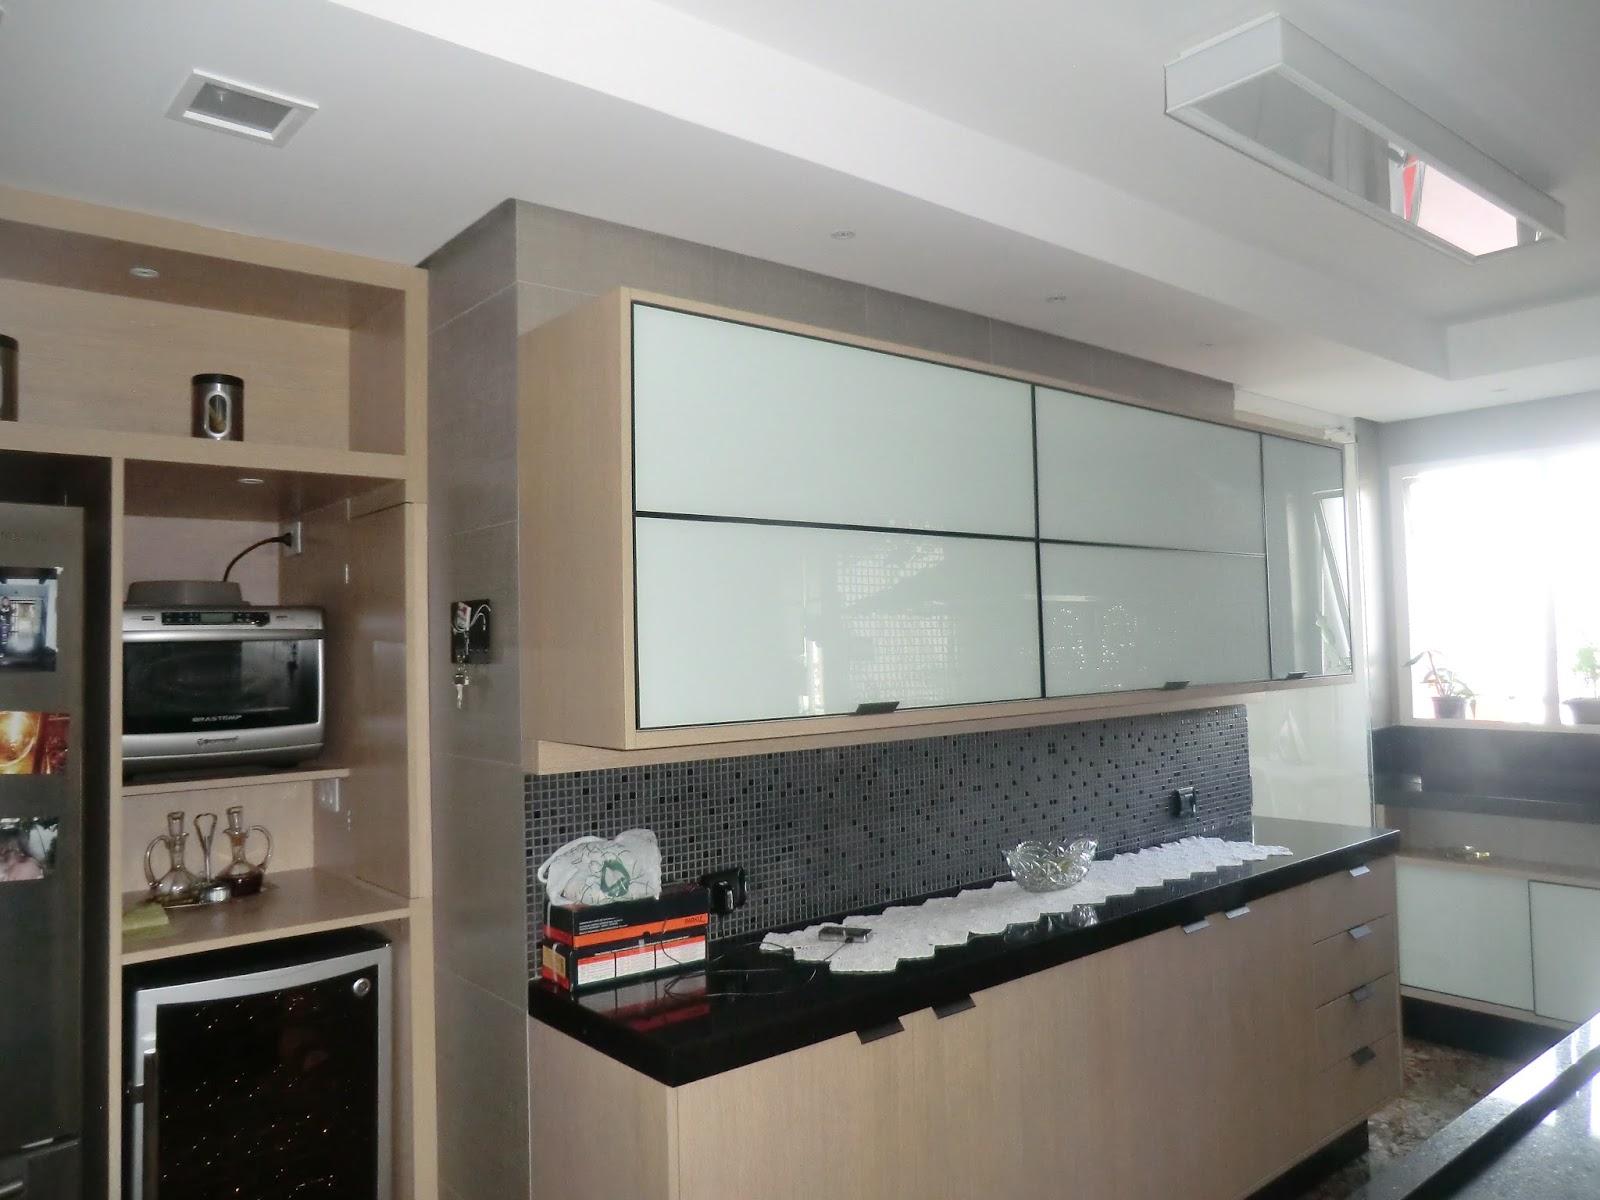 Marcenaria Radyka: Gabinete De cozinha #7A6651 1600 1200